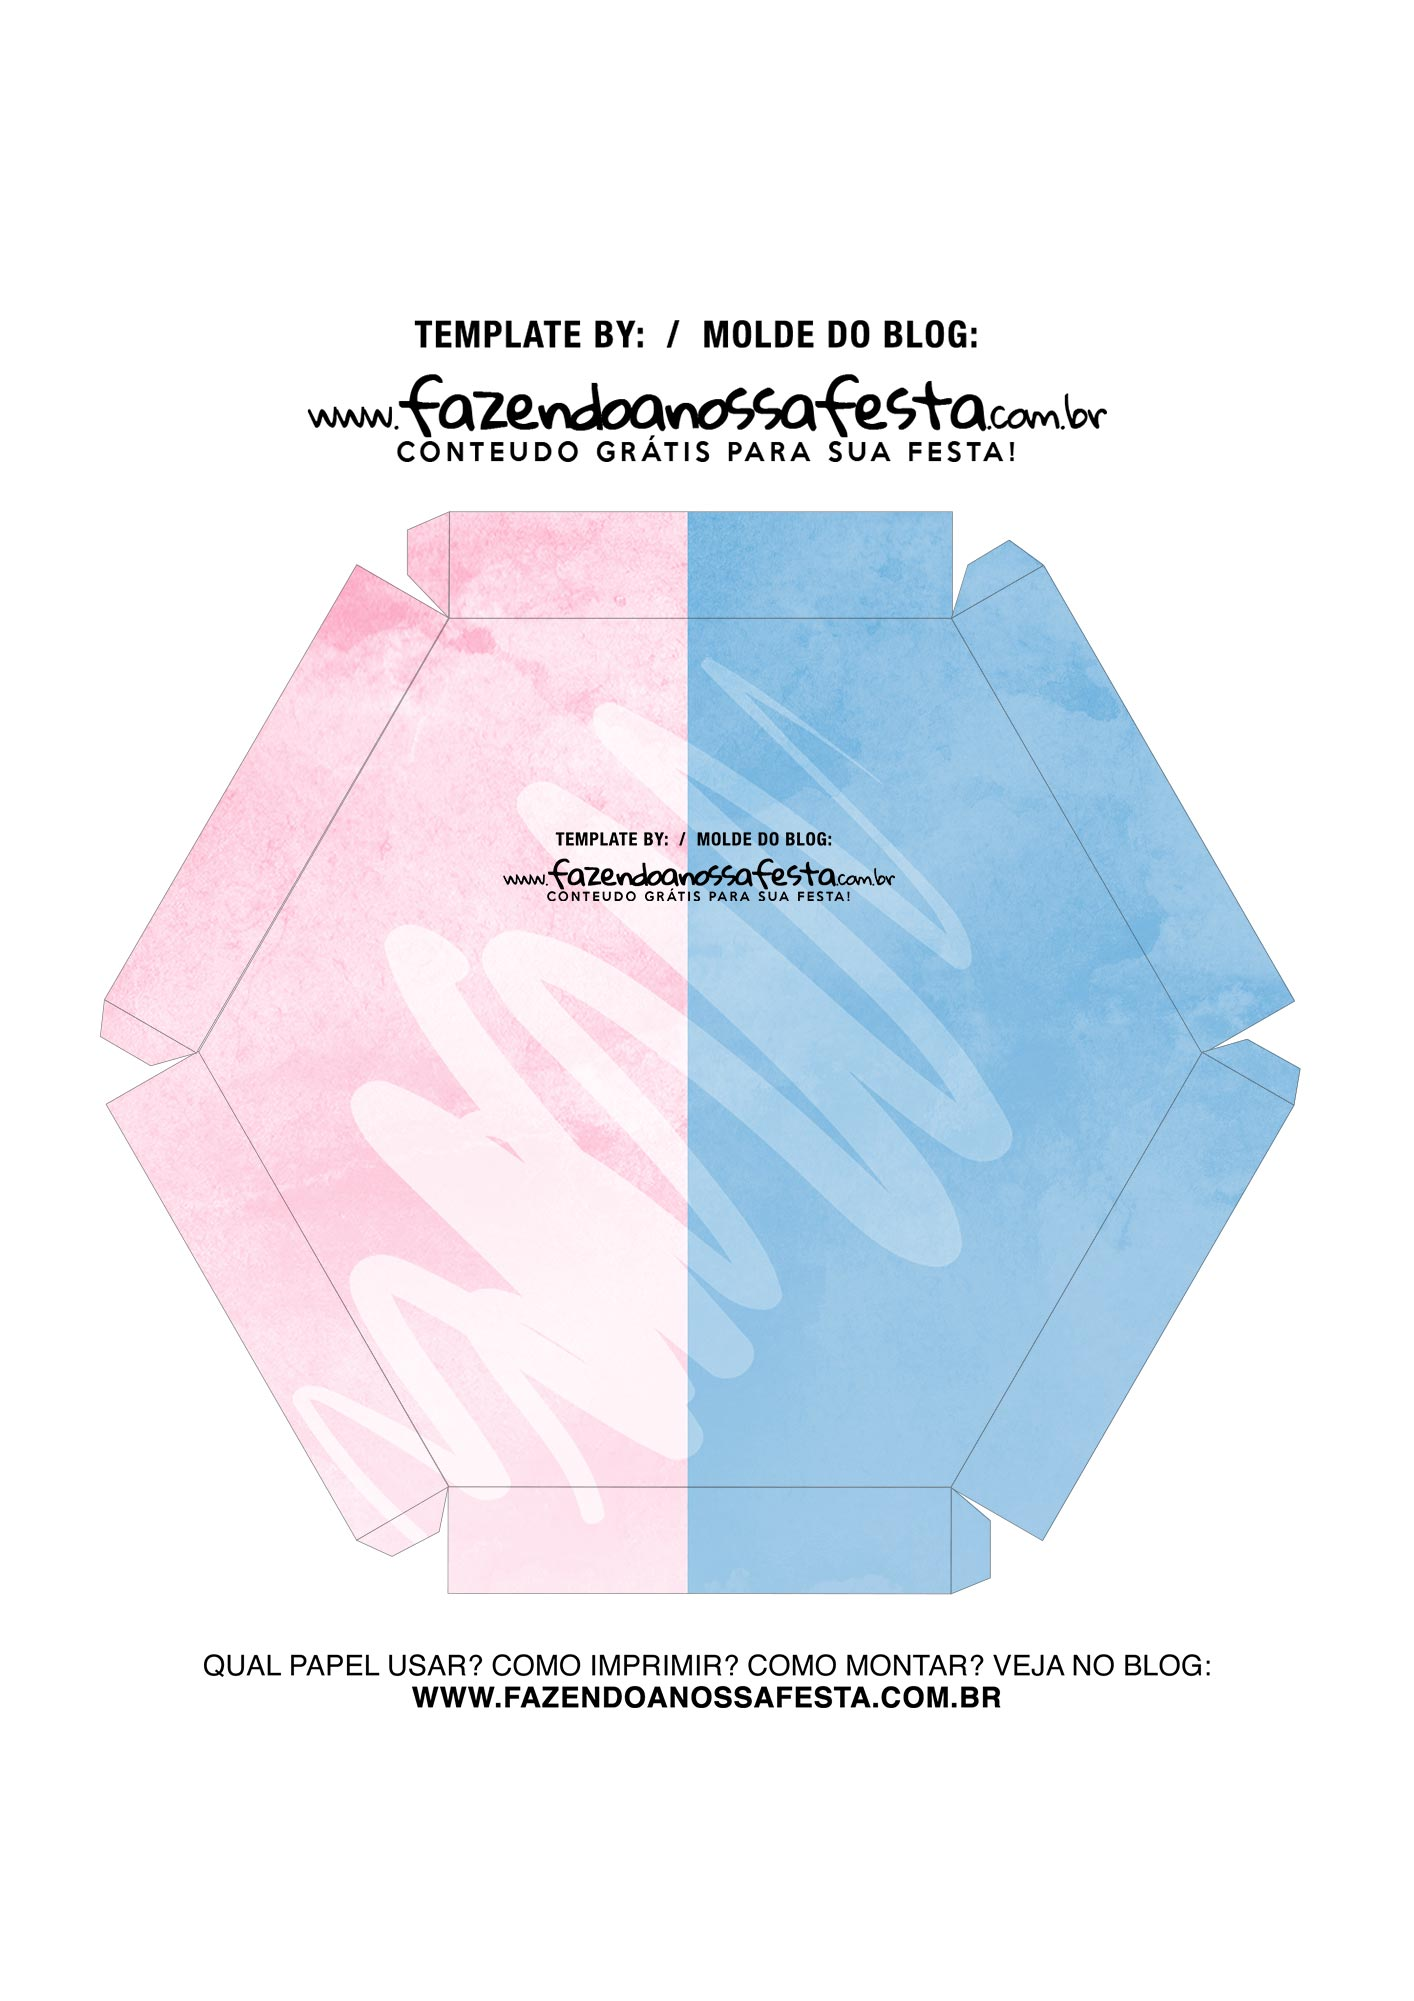 Caixa Explosiva Dia dos Namorados Rosa e Azul 8